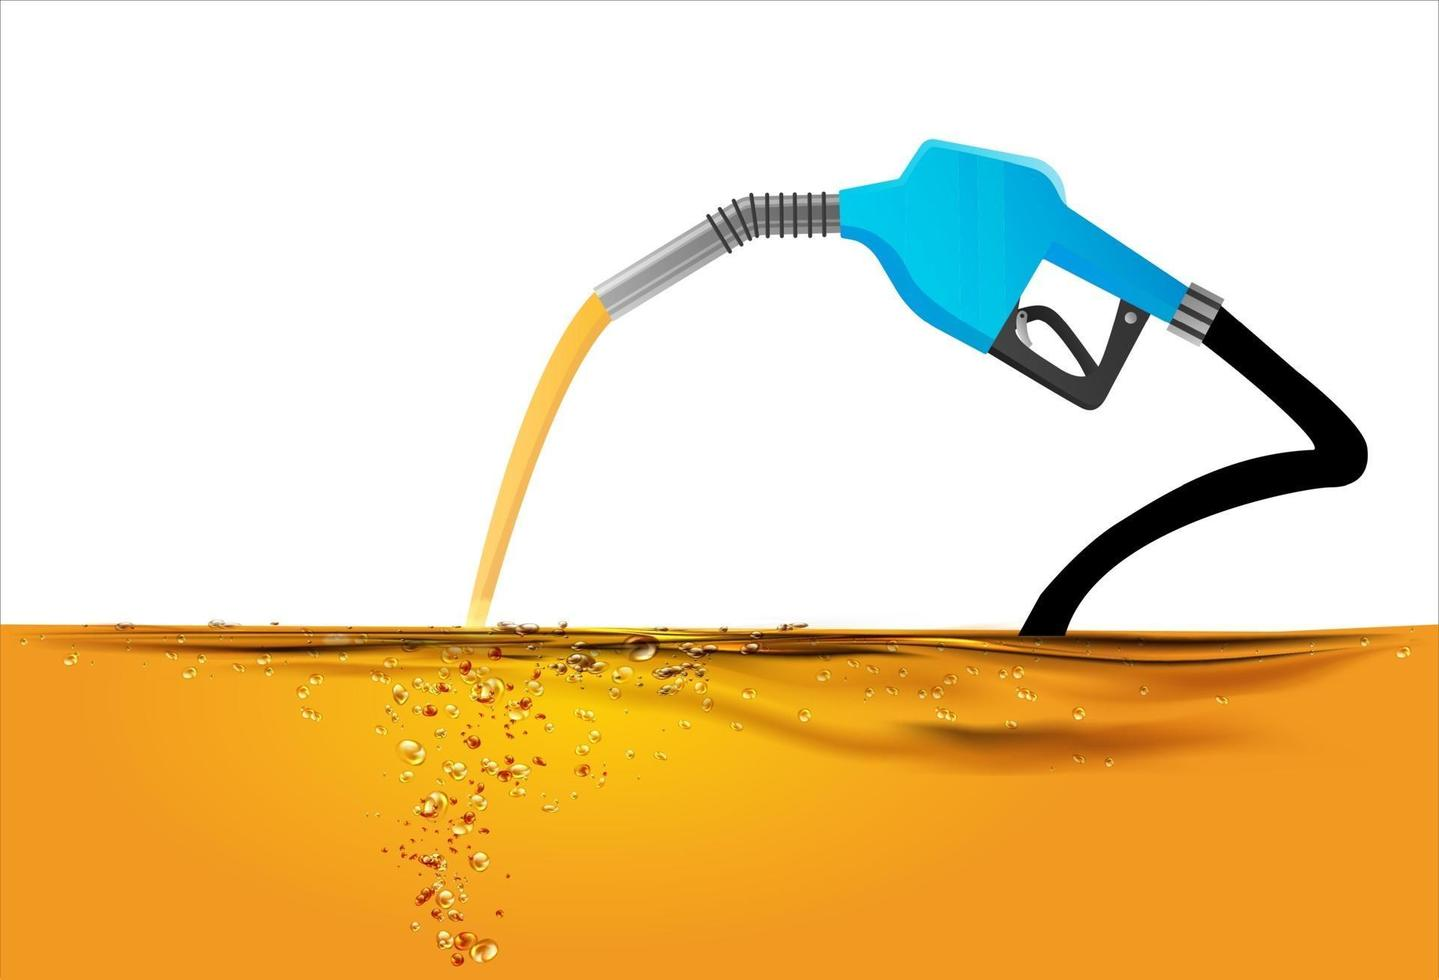 Nozzle pumping gasoline in a tank vector